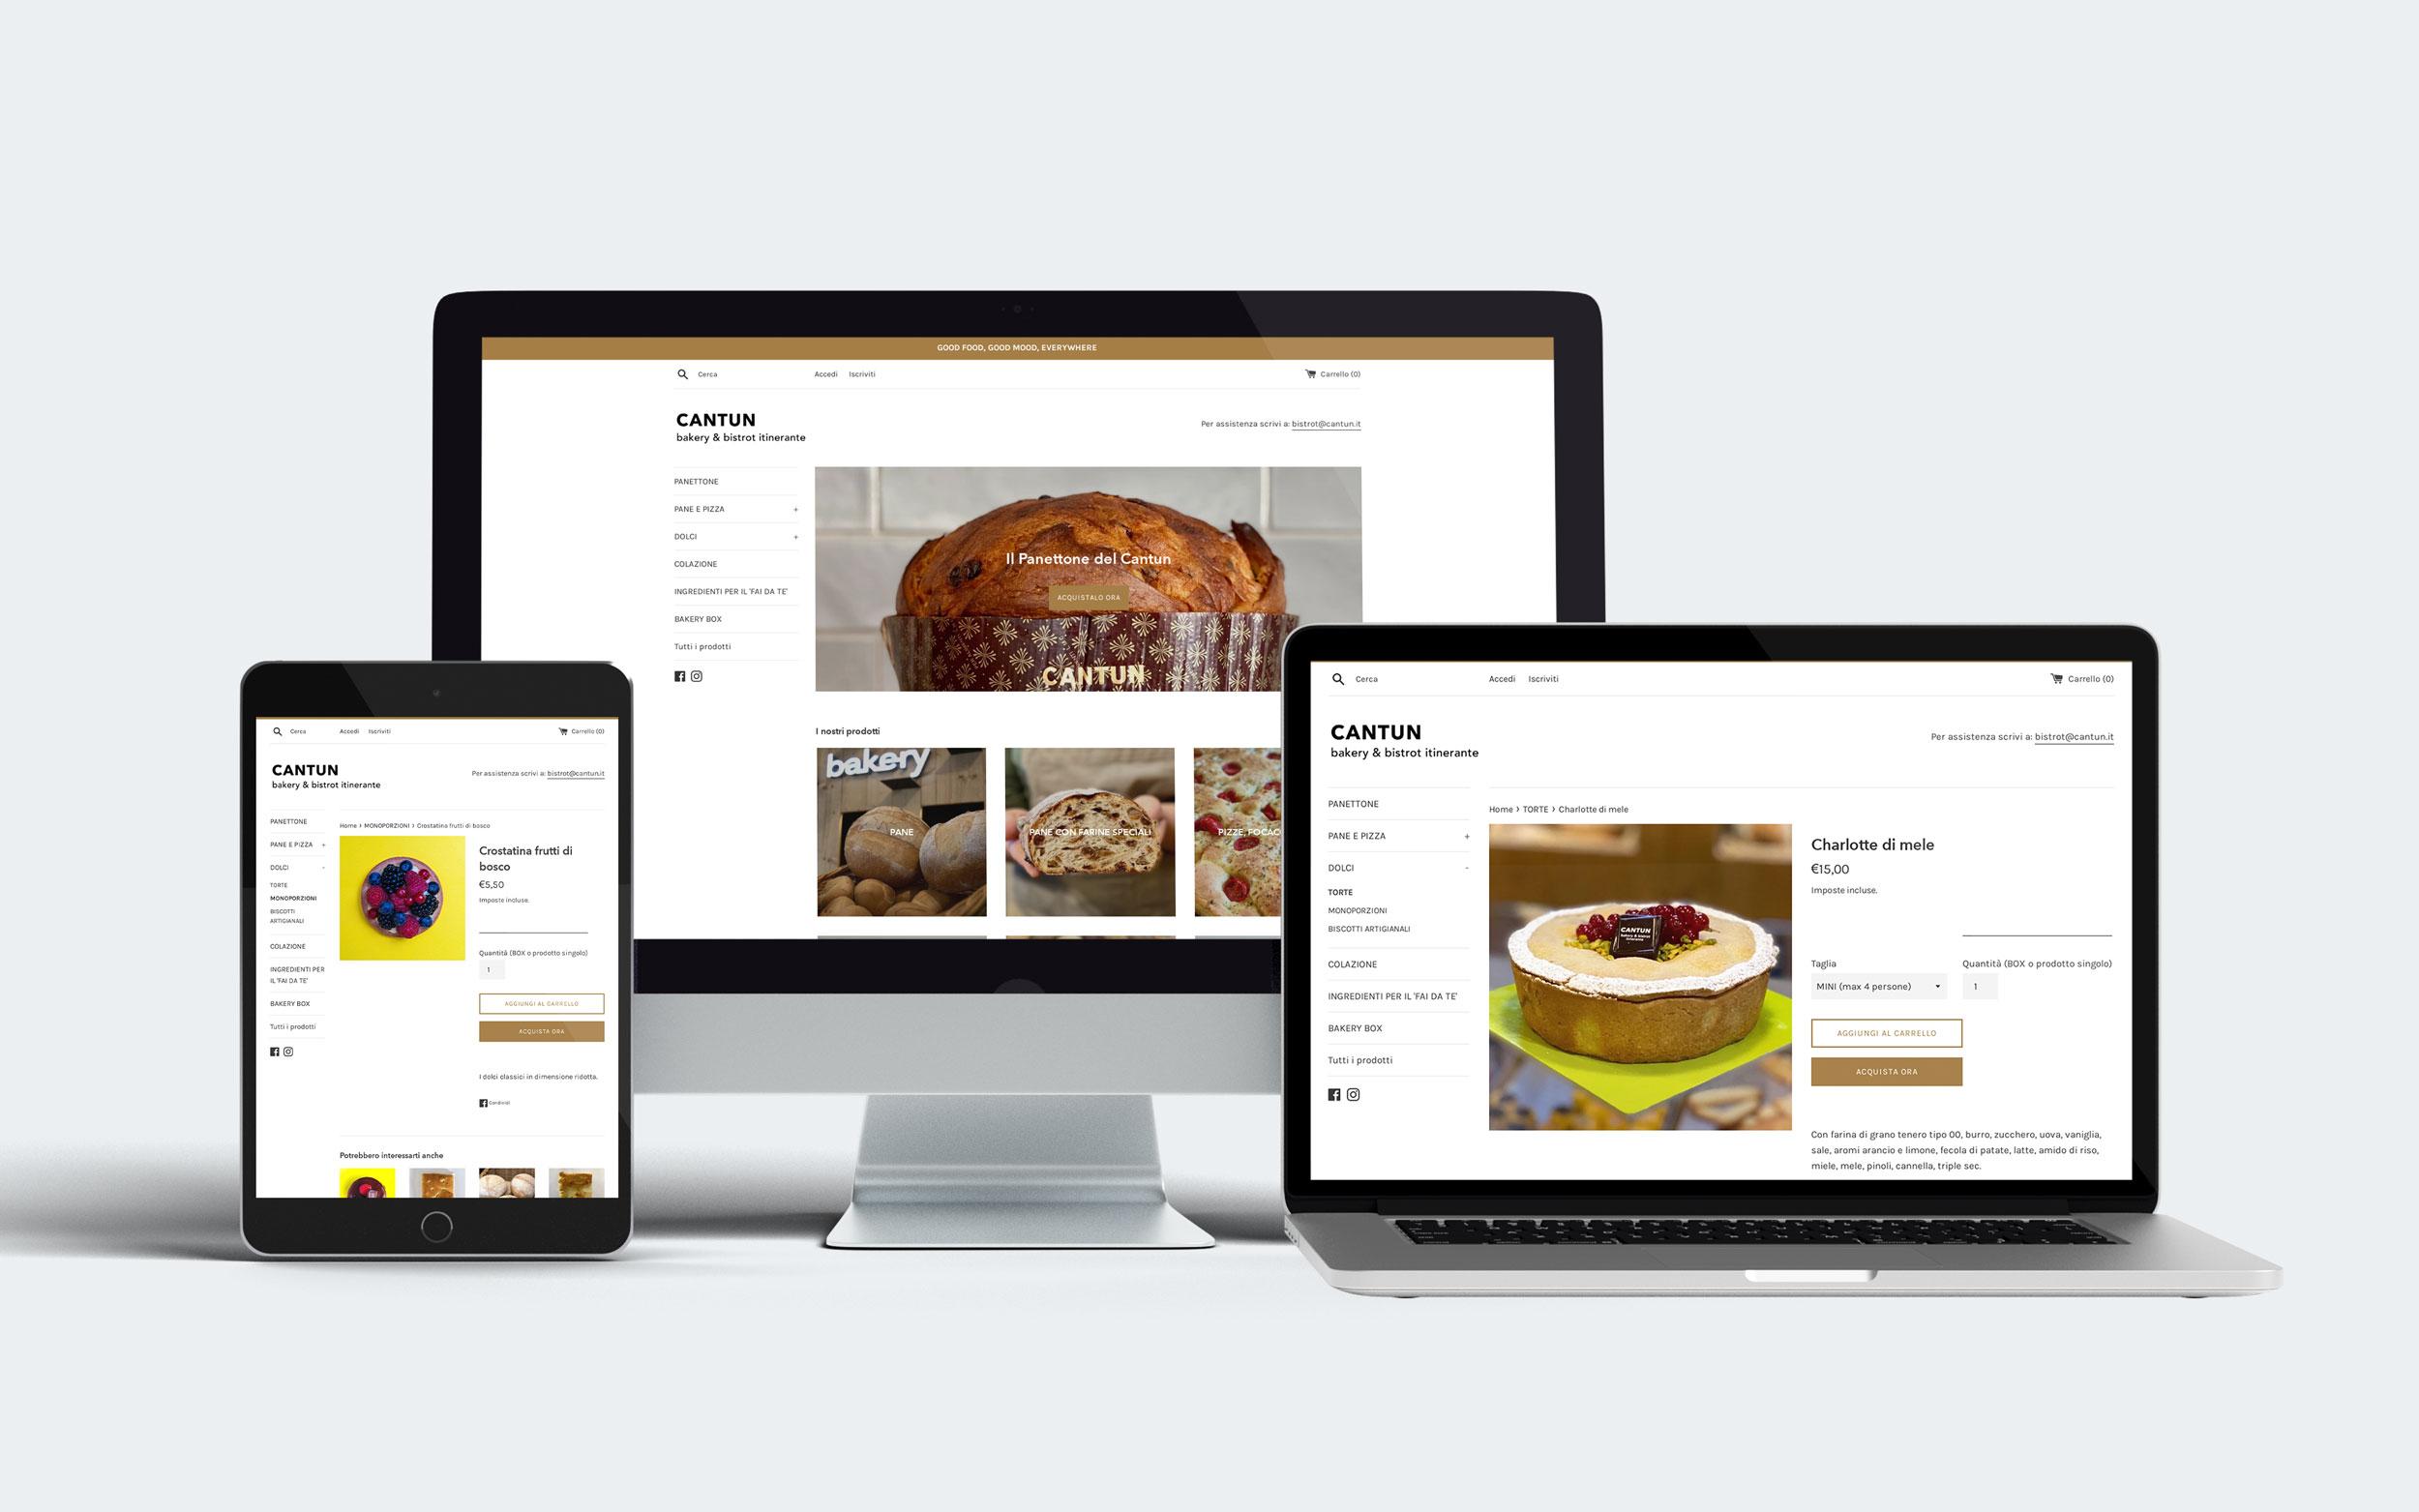 cantun-bakery-bistrot-shop-online-01